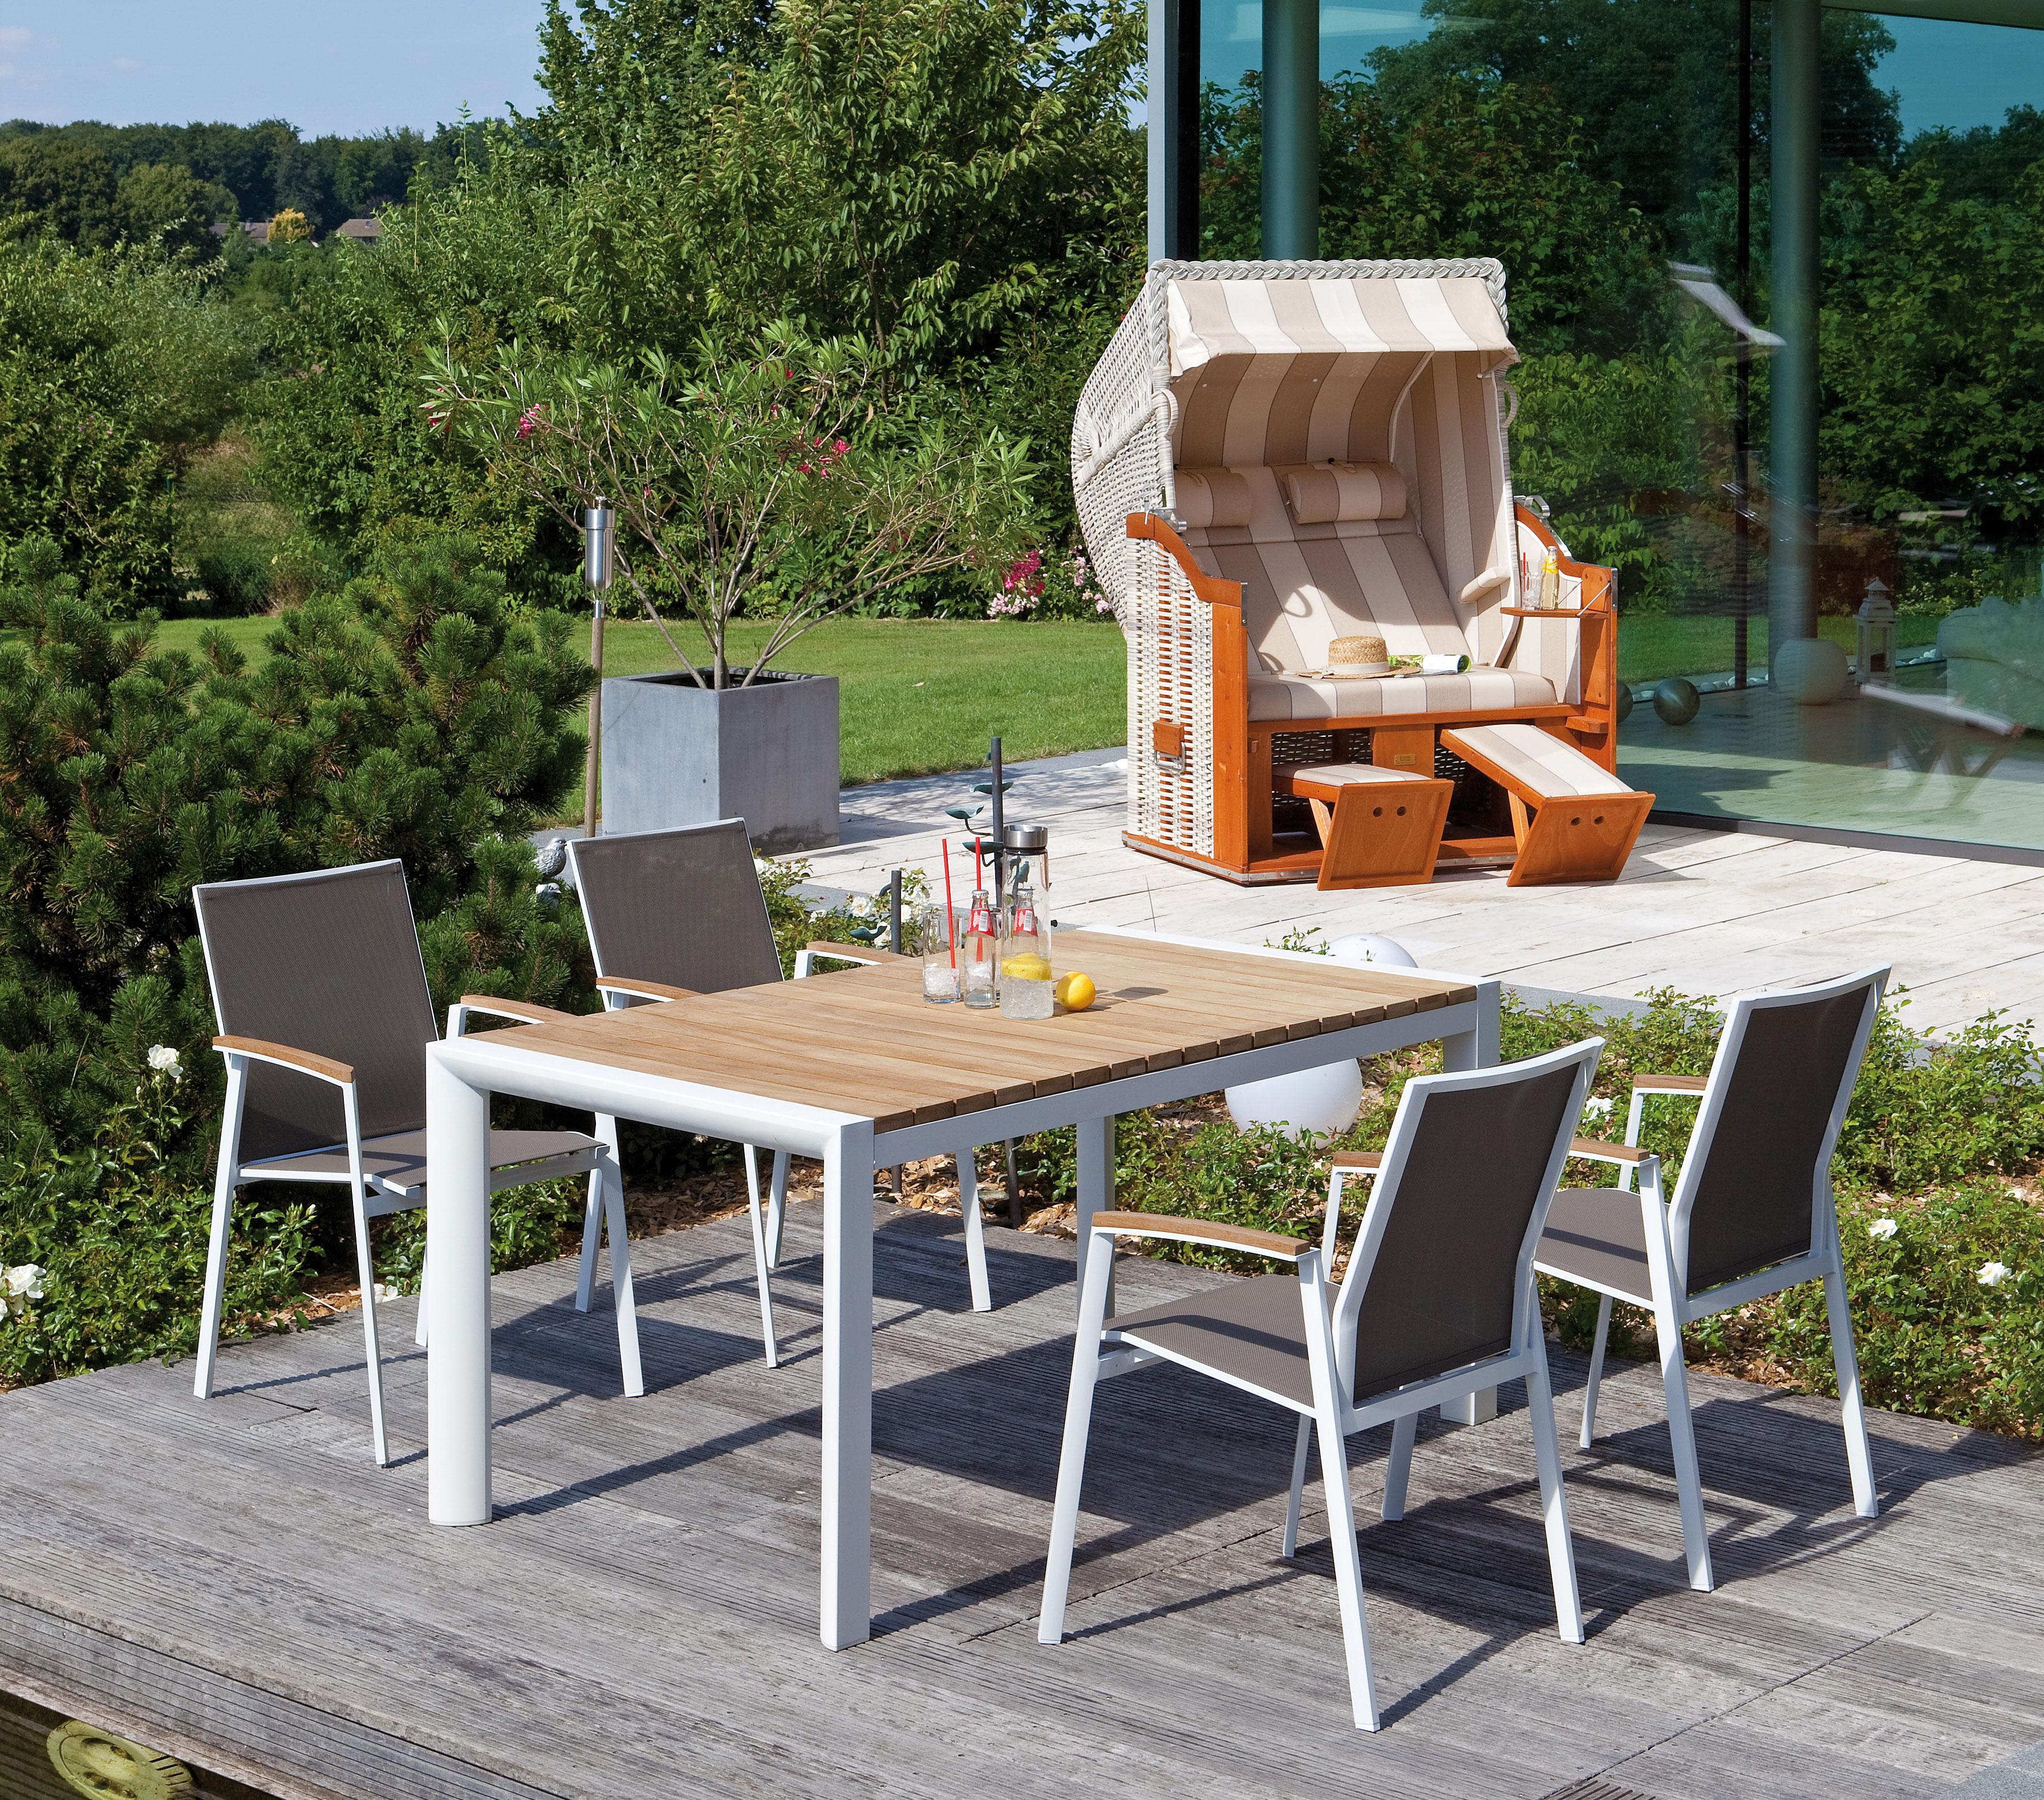 Sonnenpartner Gartenstuhl stapelbar Fresno Alu weißtaupe  bei